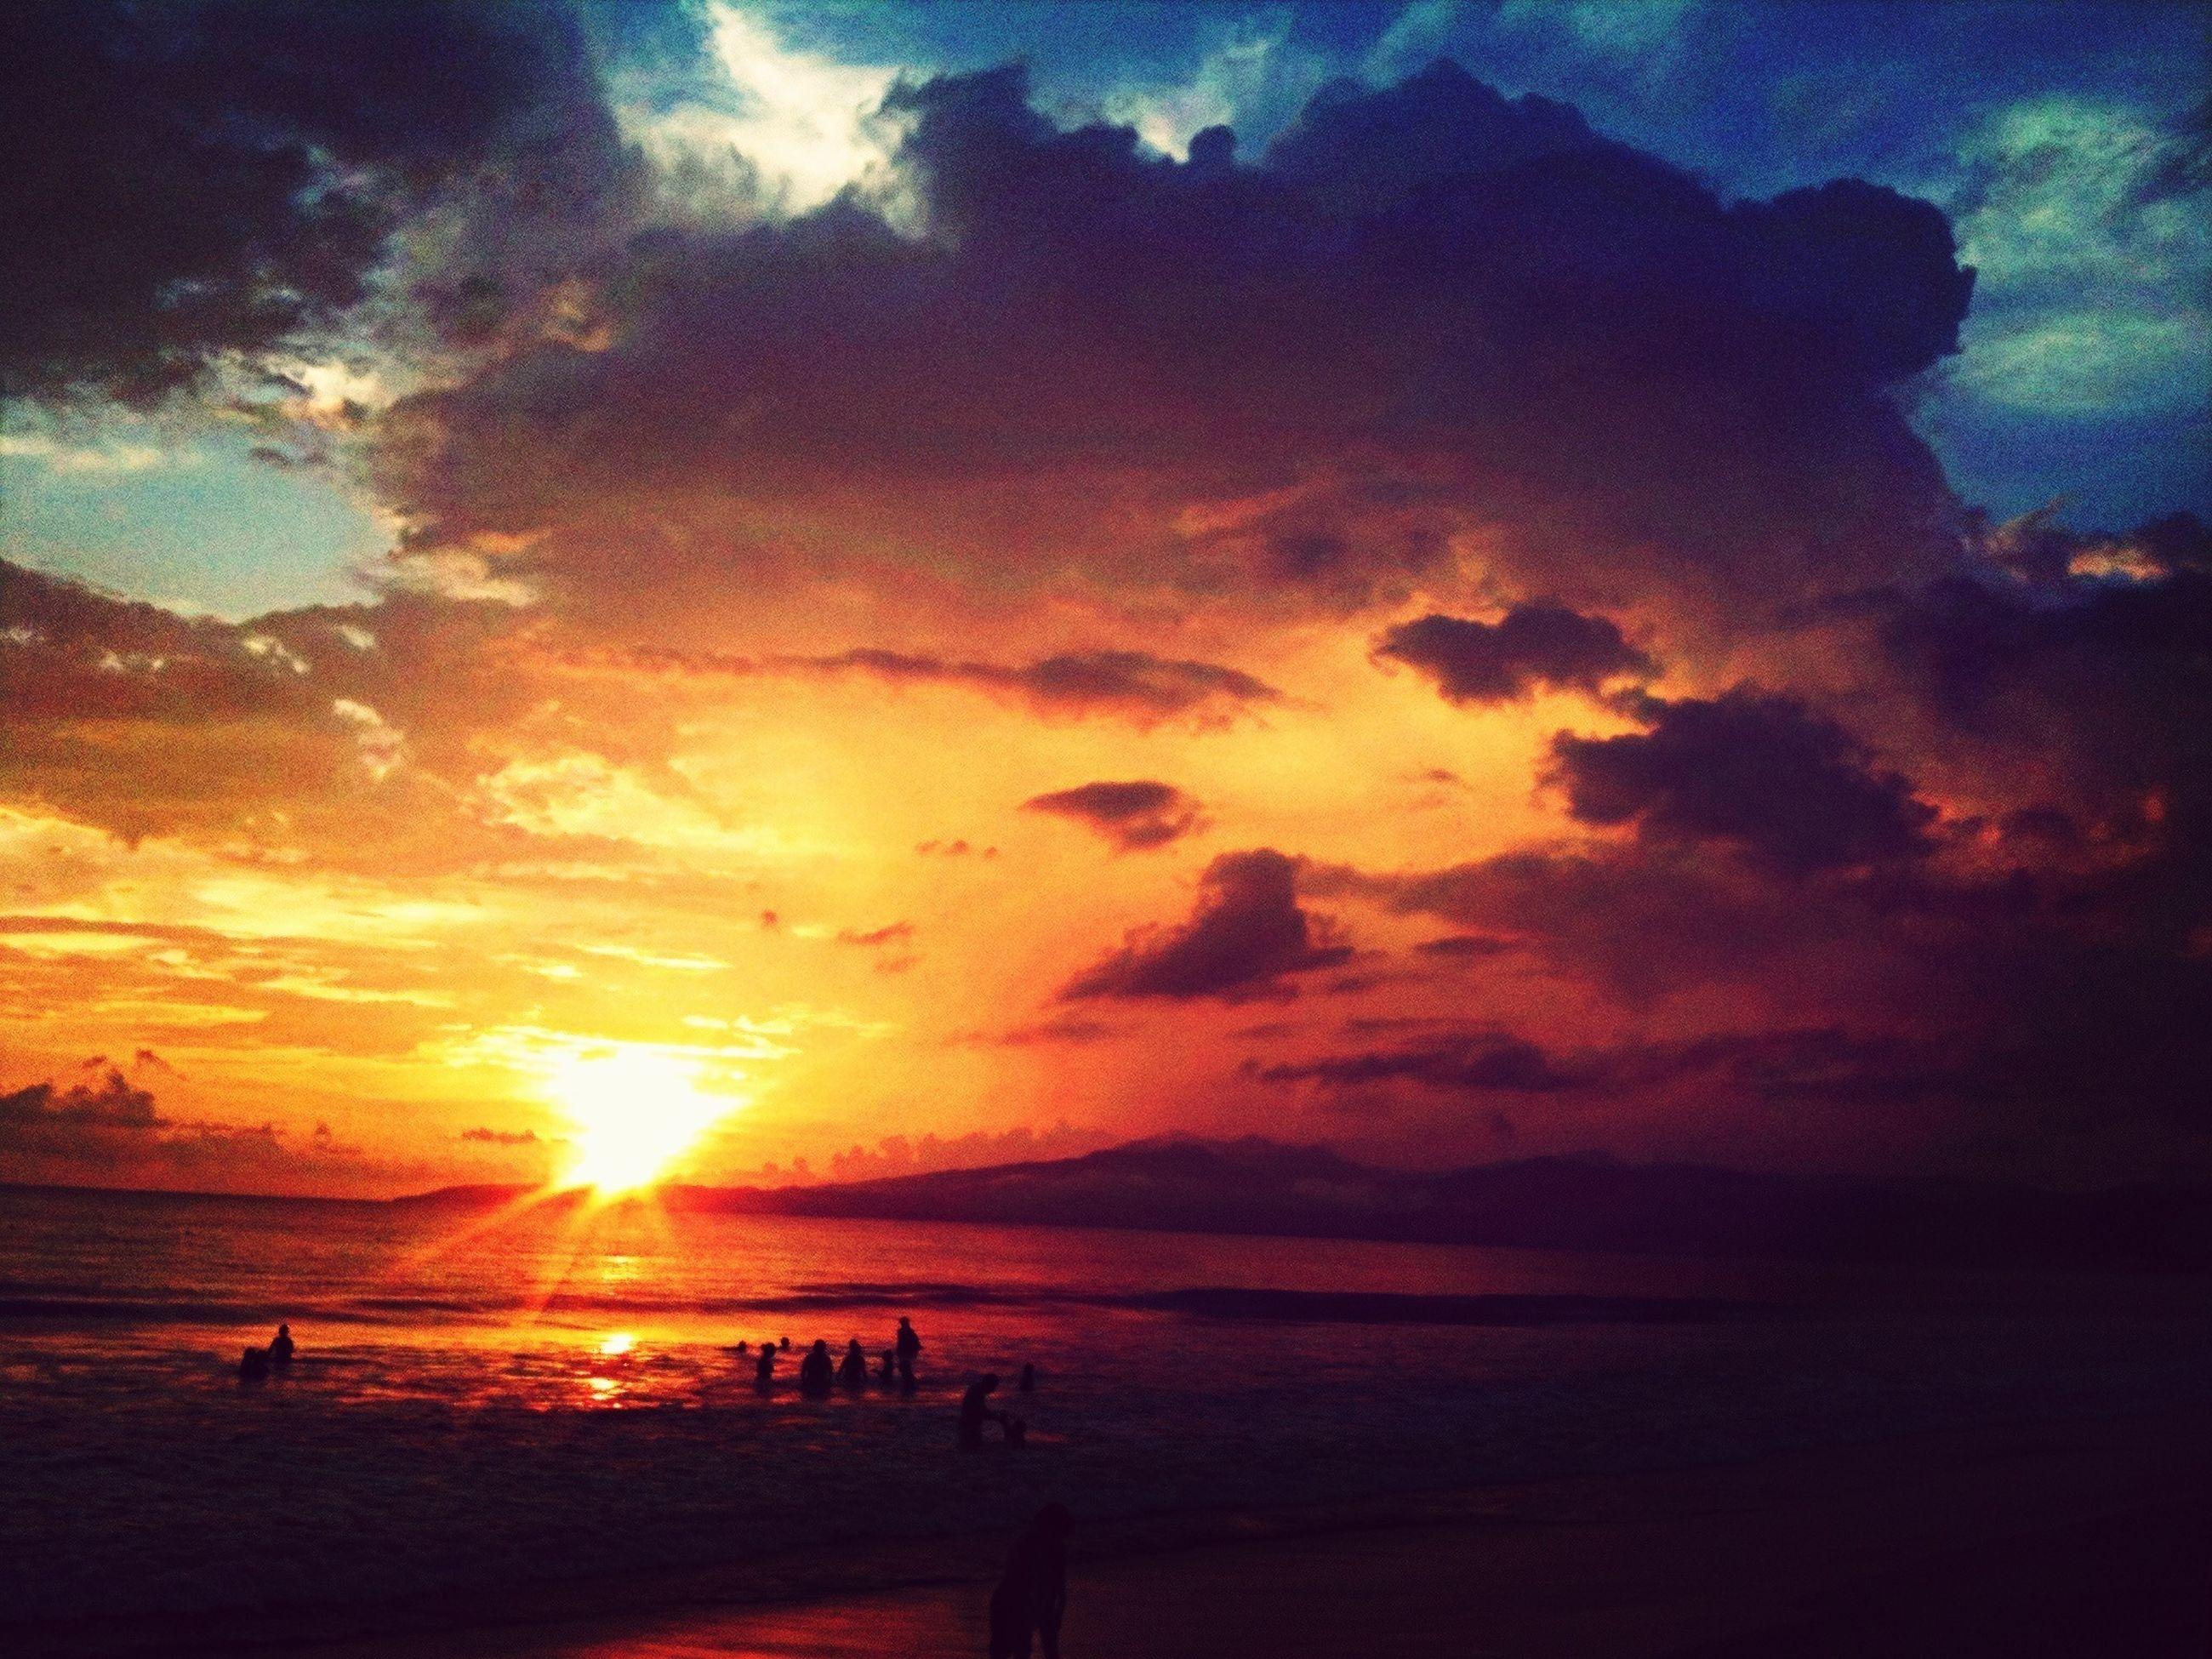 sunset, sky, sun, water, sea, scenics, cloud - sky, beauty in nature, silhouette, tranquil scene, tranquility, horizon over water, sunbeam, nature, sunlight, idyllic, cloud, orange color, reflection, cloudy